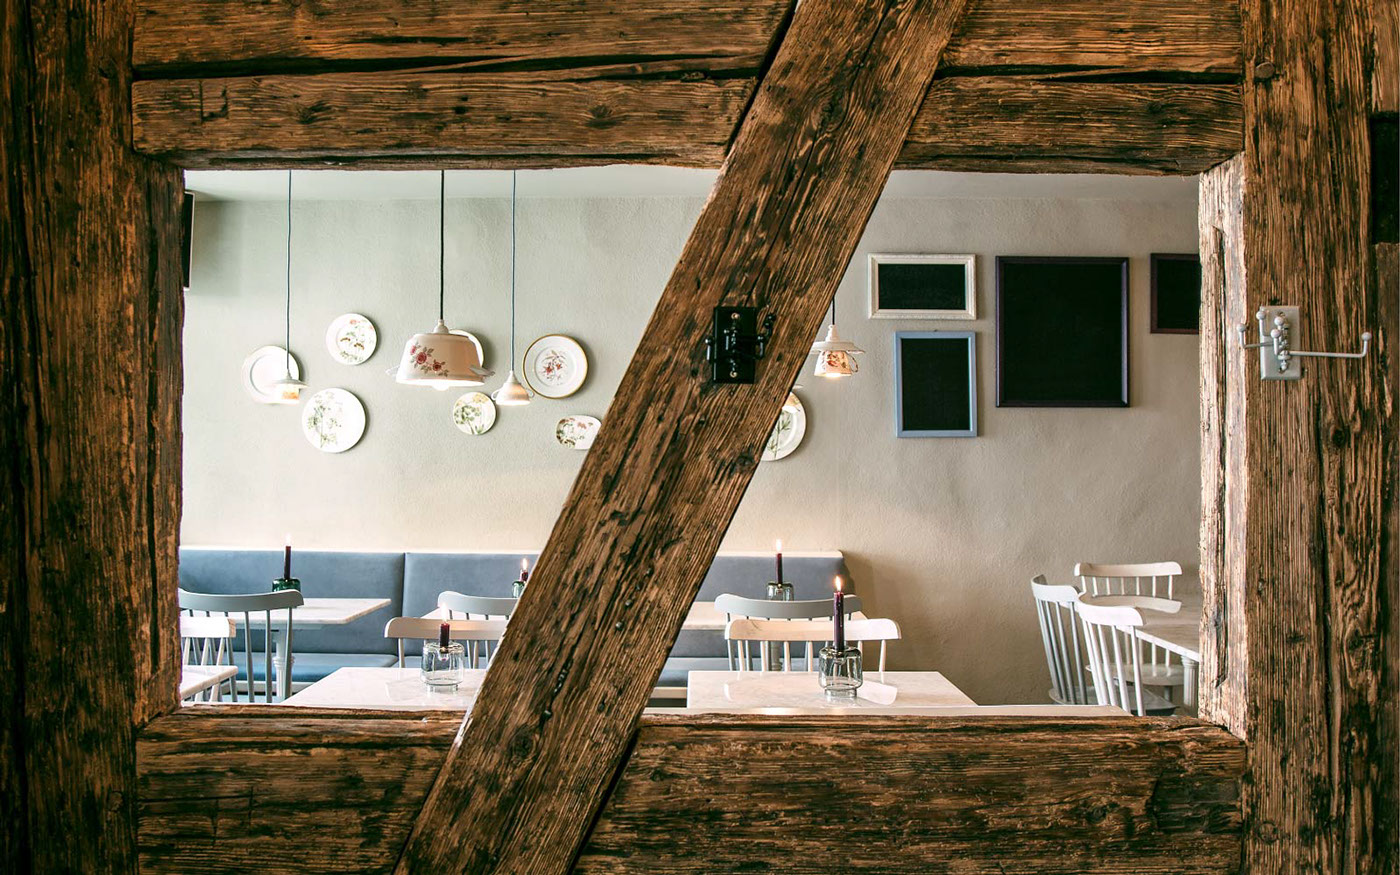 Gruener Michel-branding-interior design-hisheji (8)